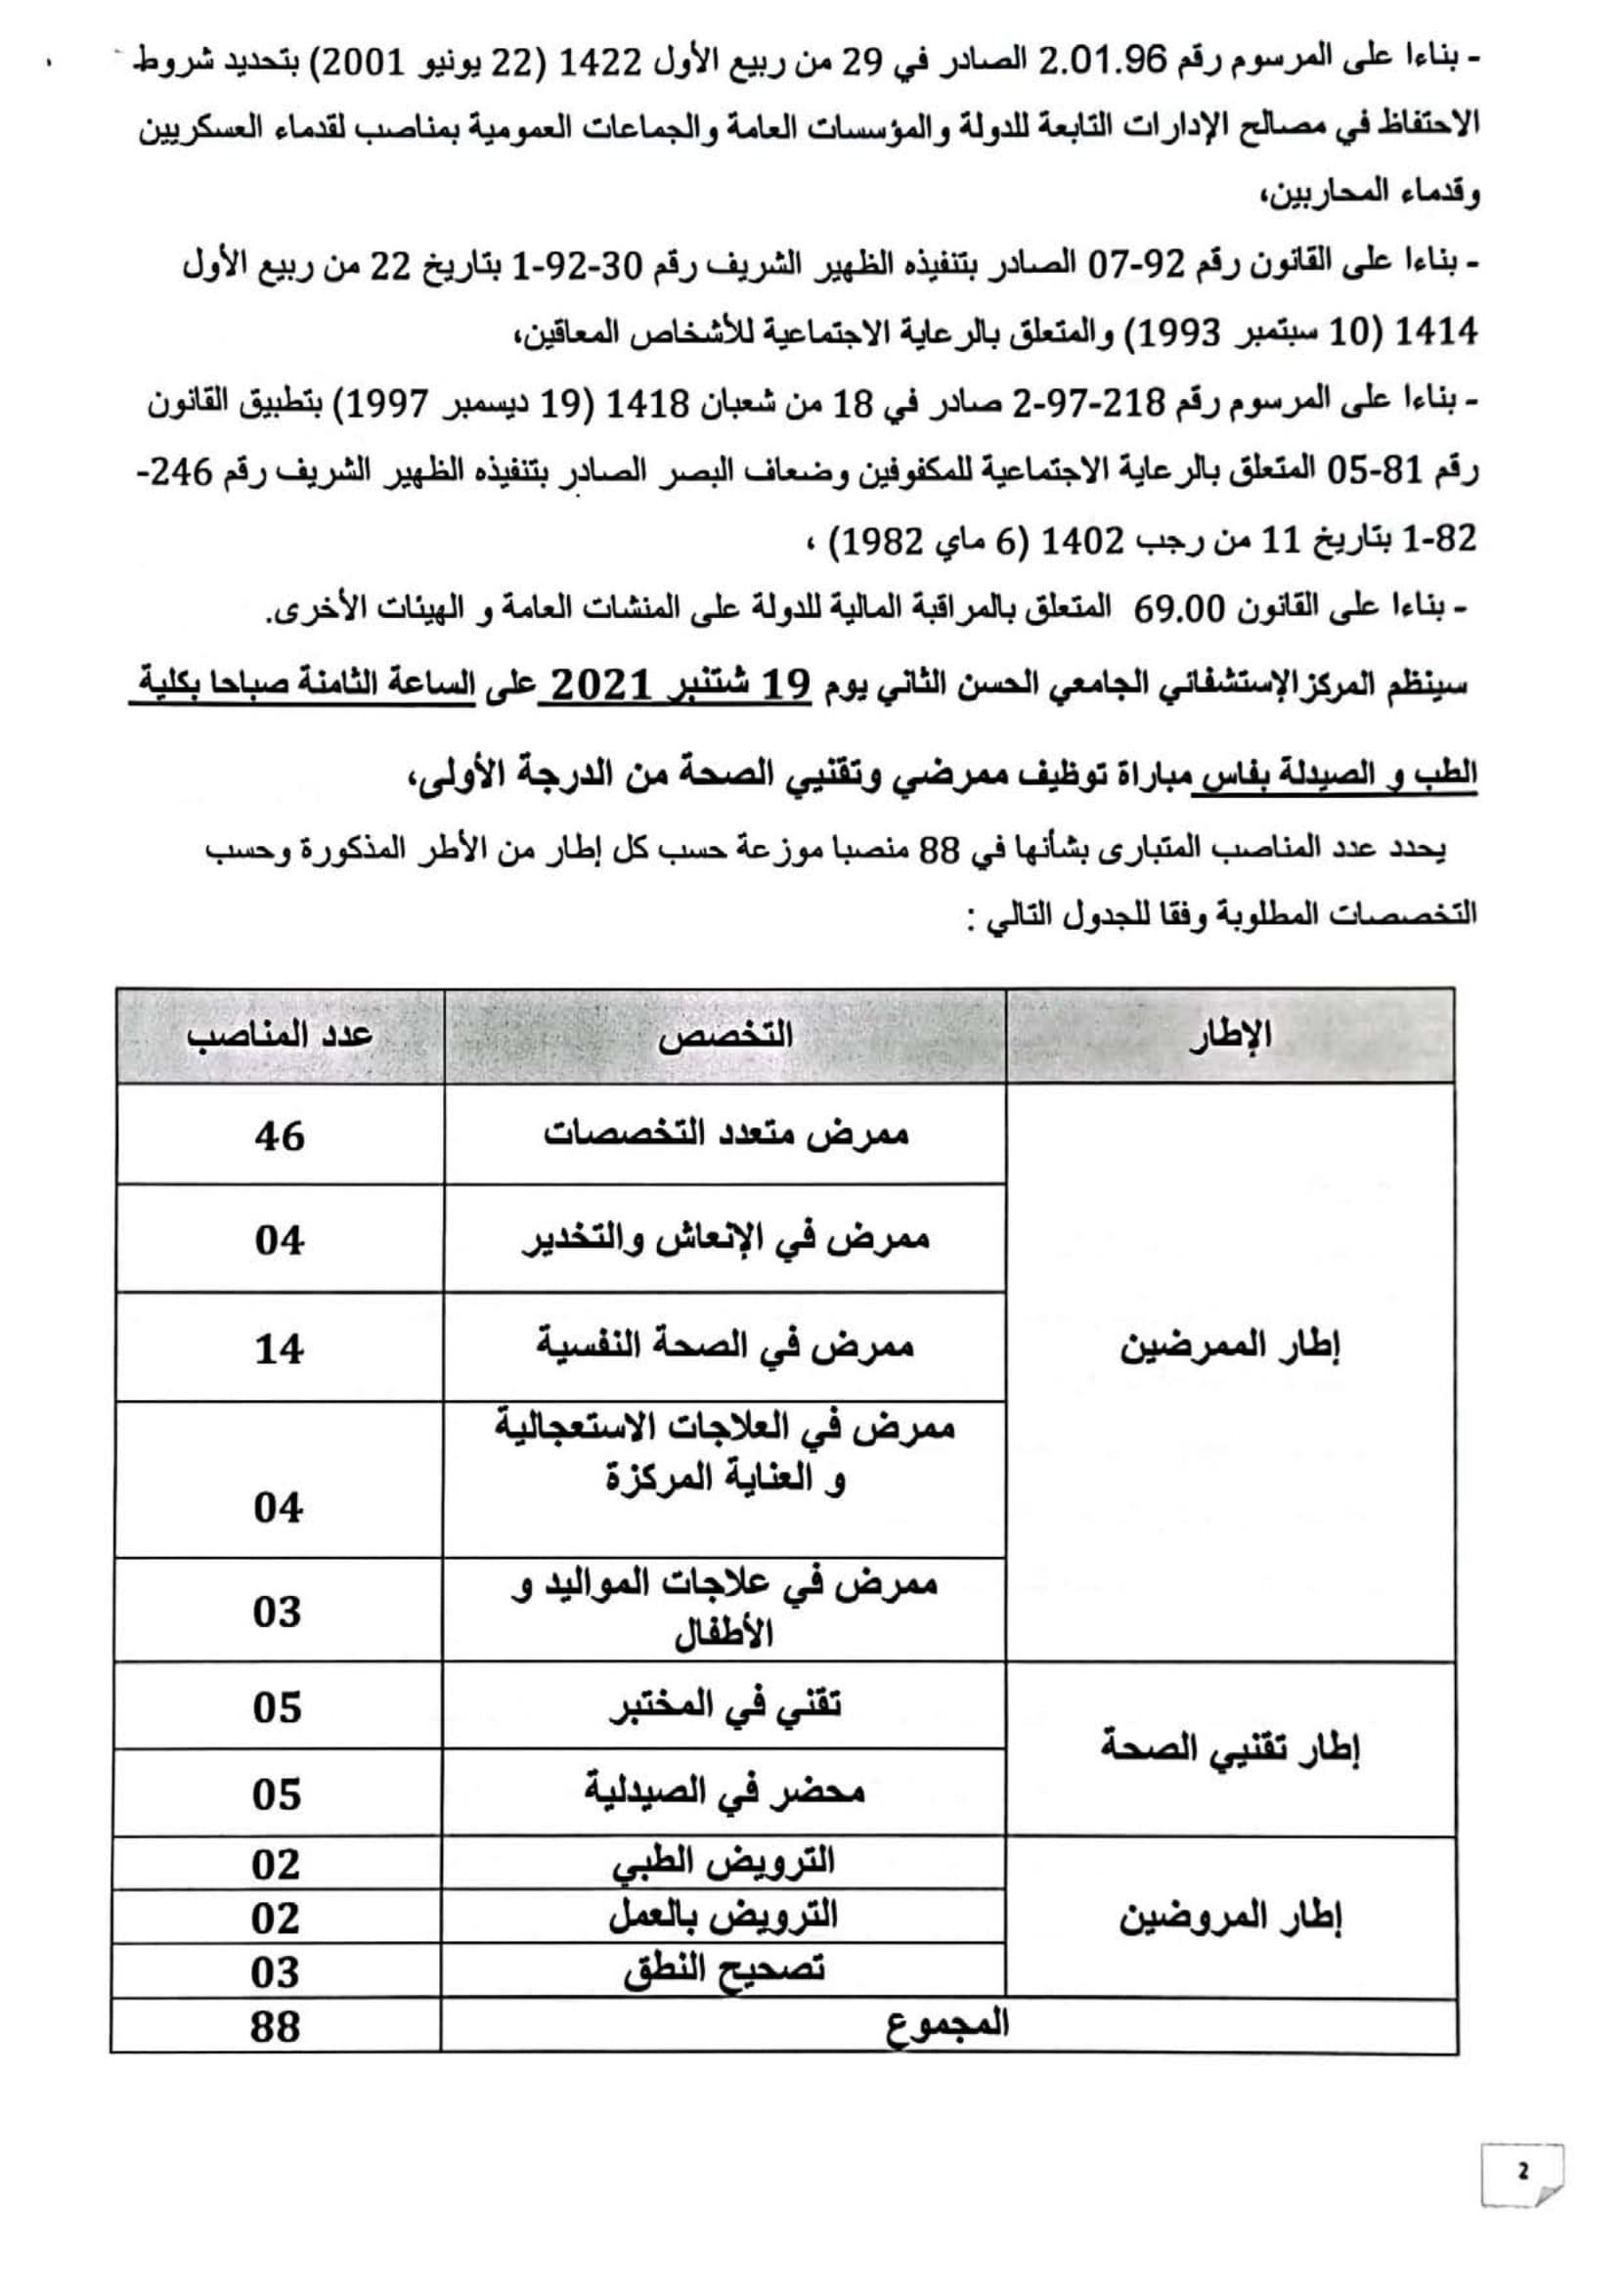 DRHFC0496 2 Concours de Recrutement CHU Hassan II 2021 (88 Postes)